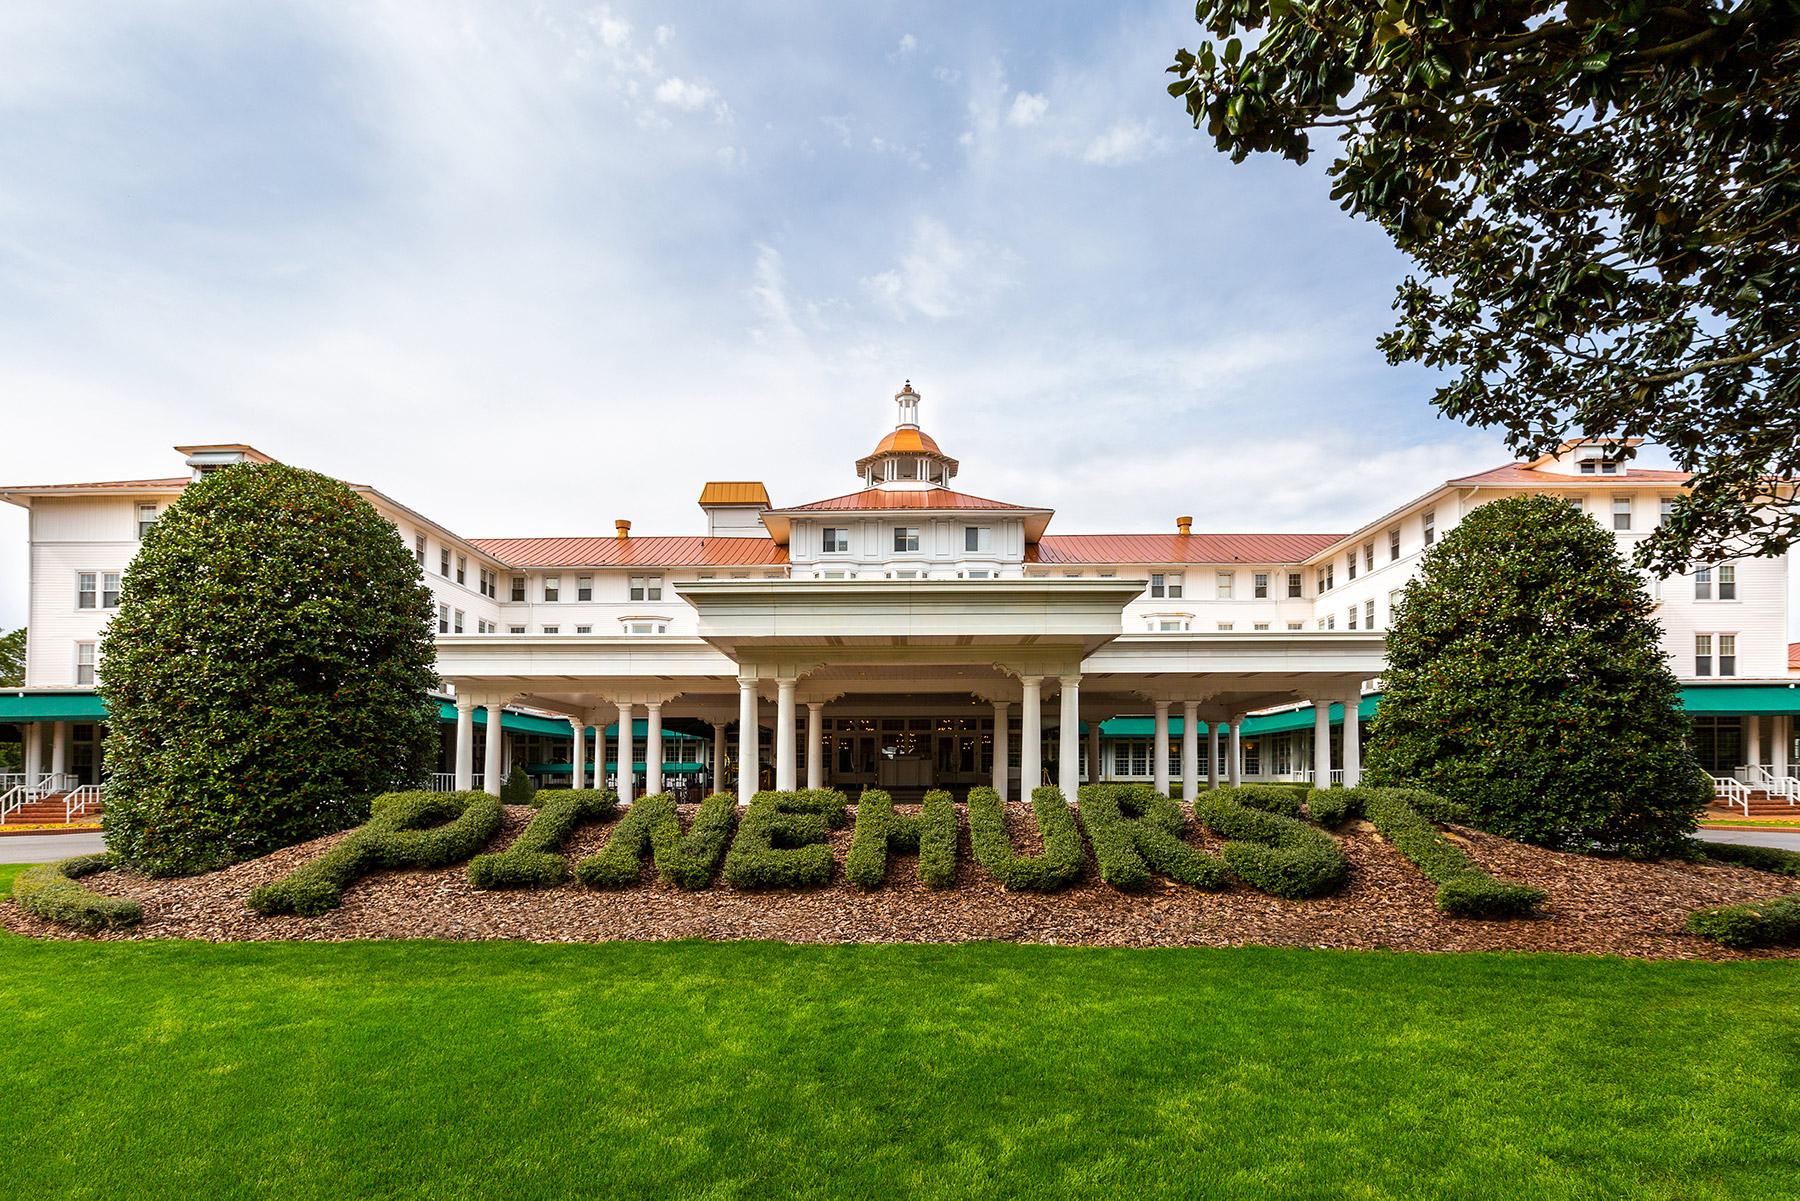 Carolina Hotel Exterior NEW